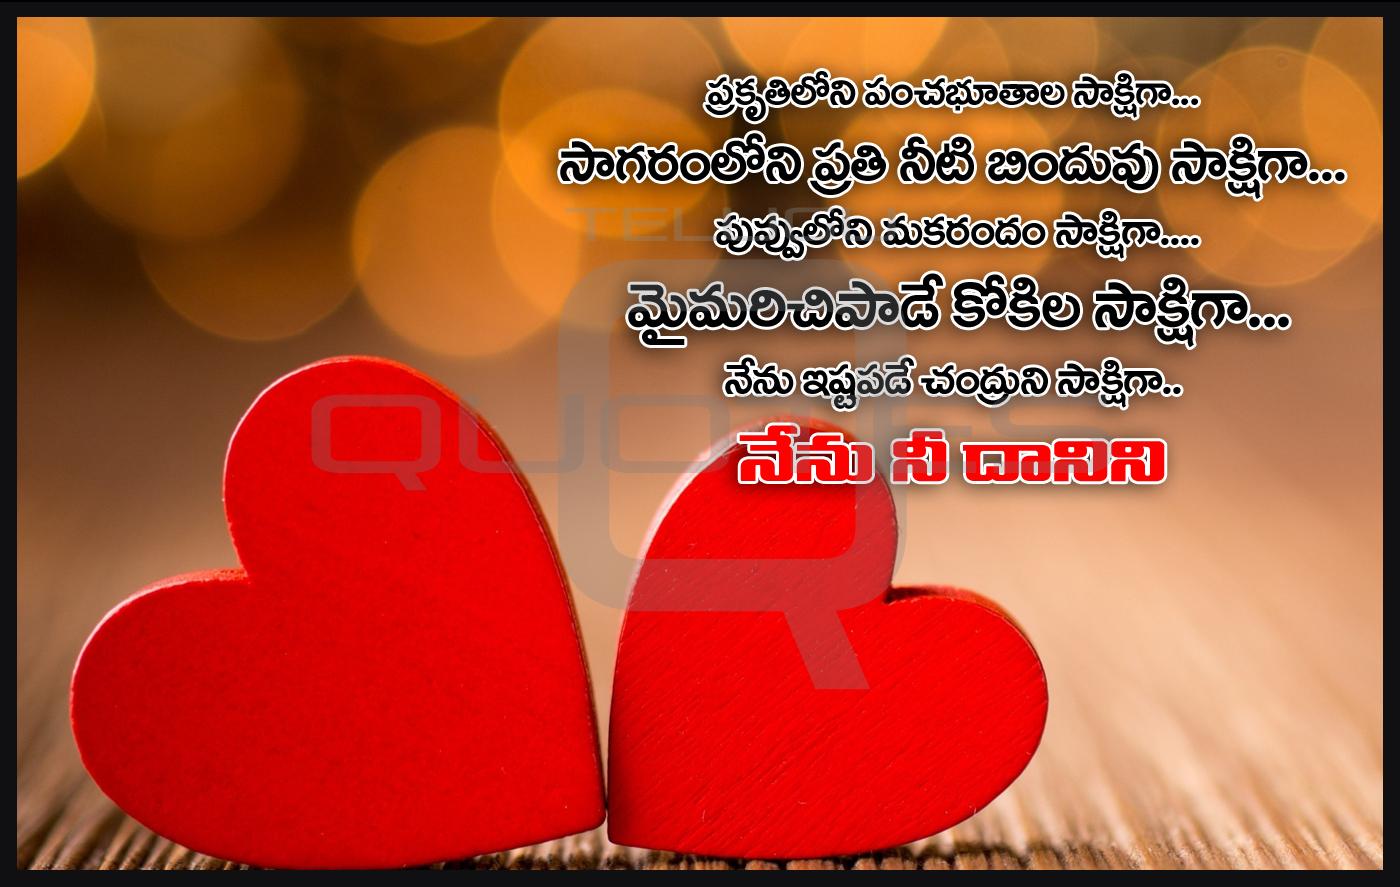 Popular Wallpaper Love Telugu - Famous%2BLove%2BFeelings%2Band%2BSayings%2Bin%2BTelugu%2BHD%2BWallpapers%2BBest%2BLove%2BTelugu%2BQuotes%2BImages  Perfect Image Reference_42398.JPG